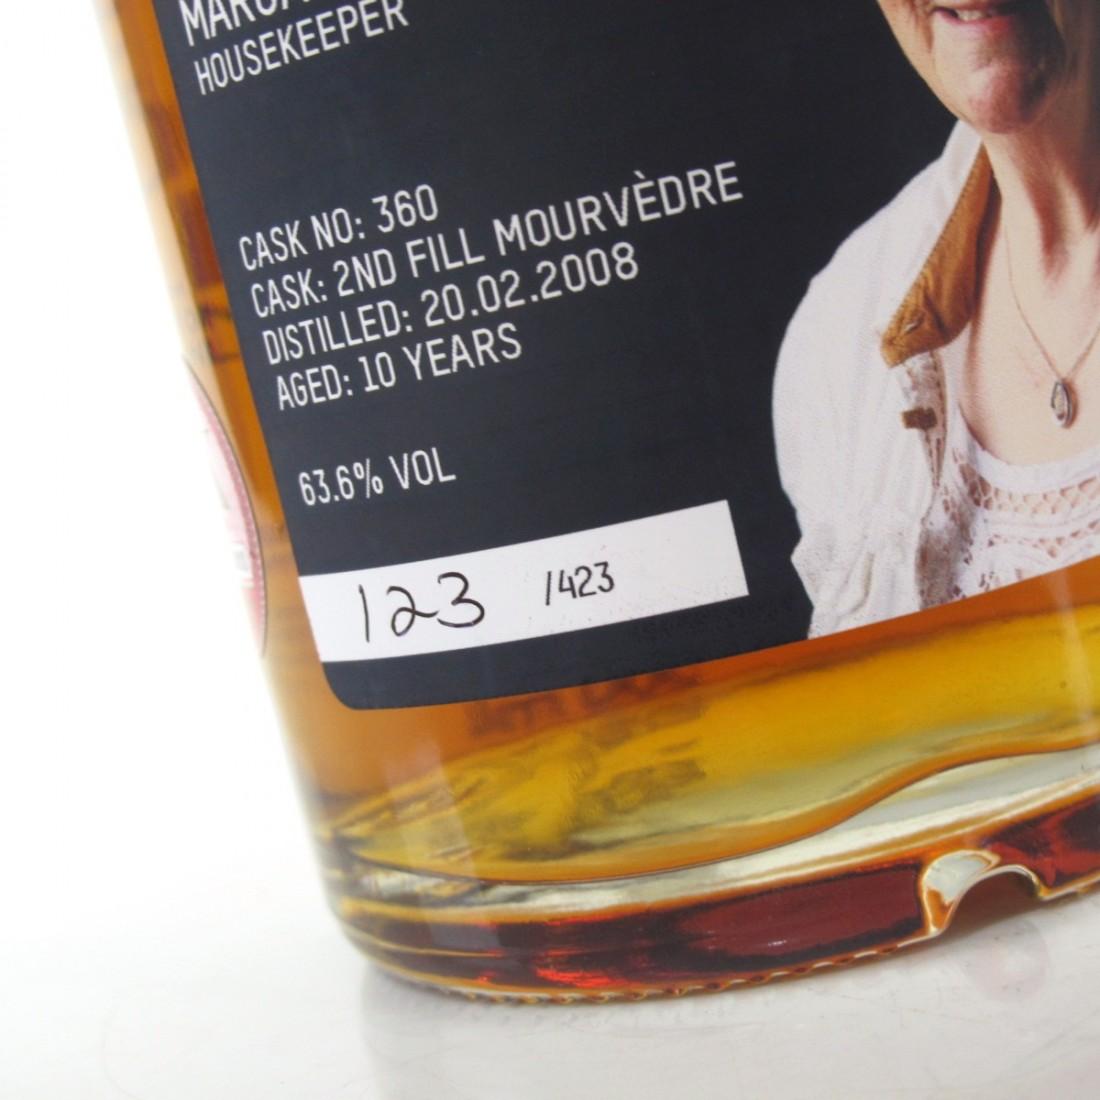 Bruichladdich 2008 Margaret Shaw Valinch 10 Year Old / Mourvedre Red Wine Cask